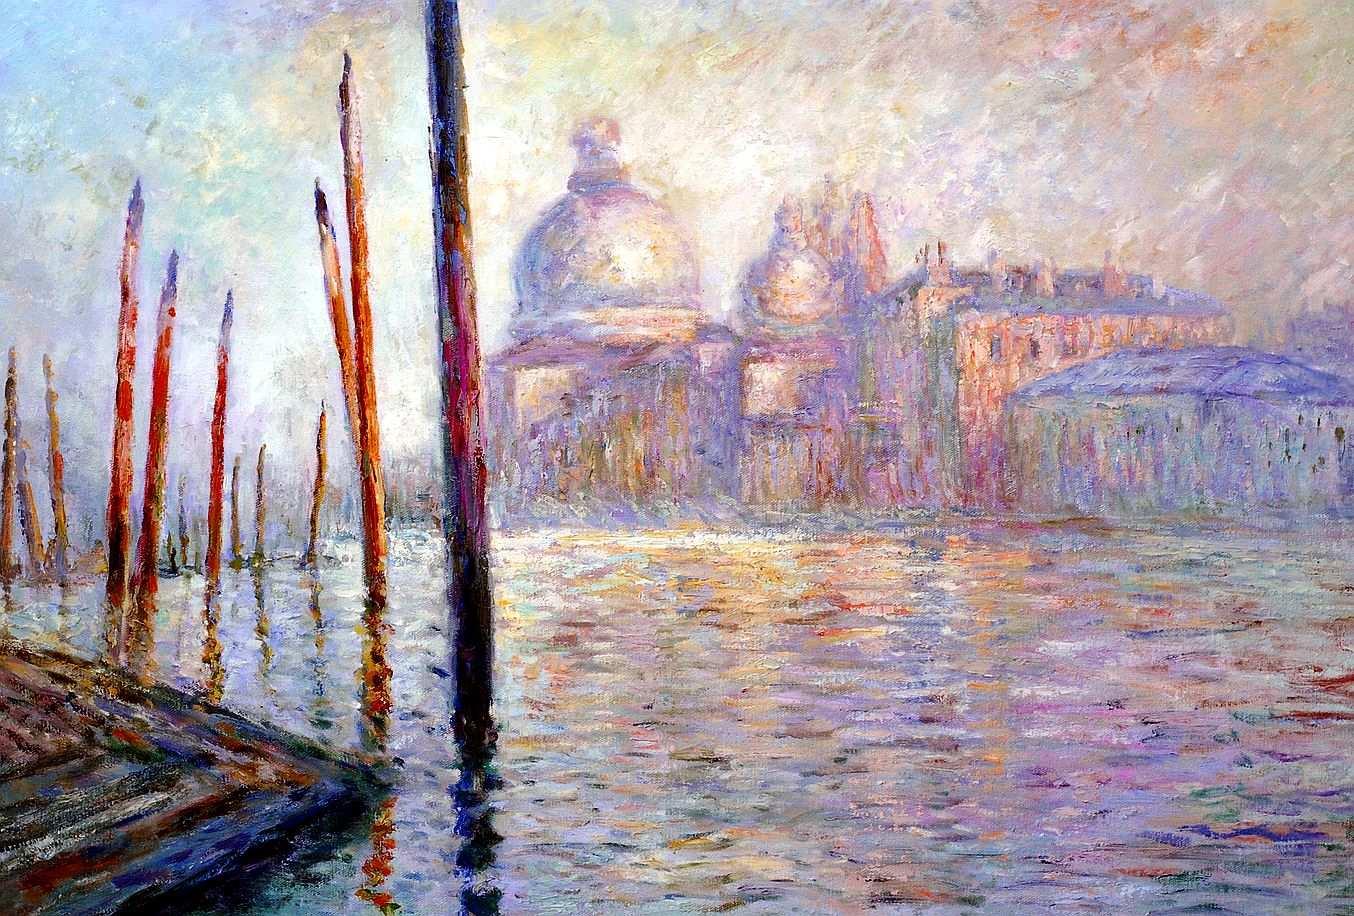 Claude Monet - Blick auf Venedig d95716 60x90cm exzellentes Ölgemälde handgemalt Museumsqualität